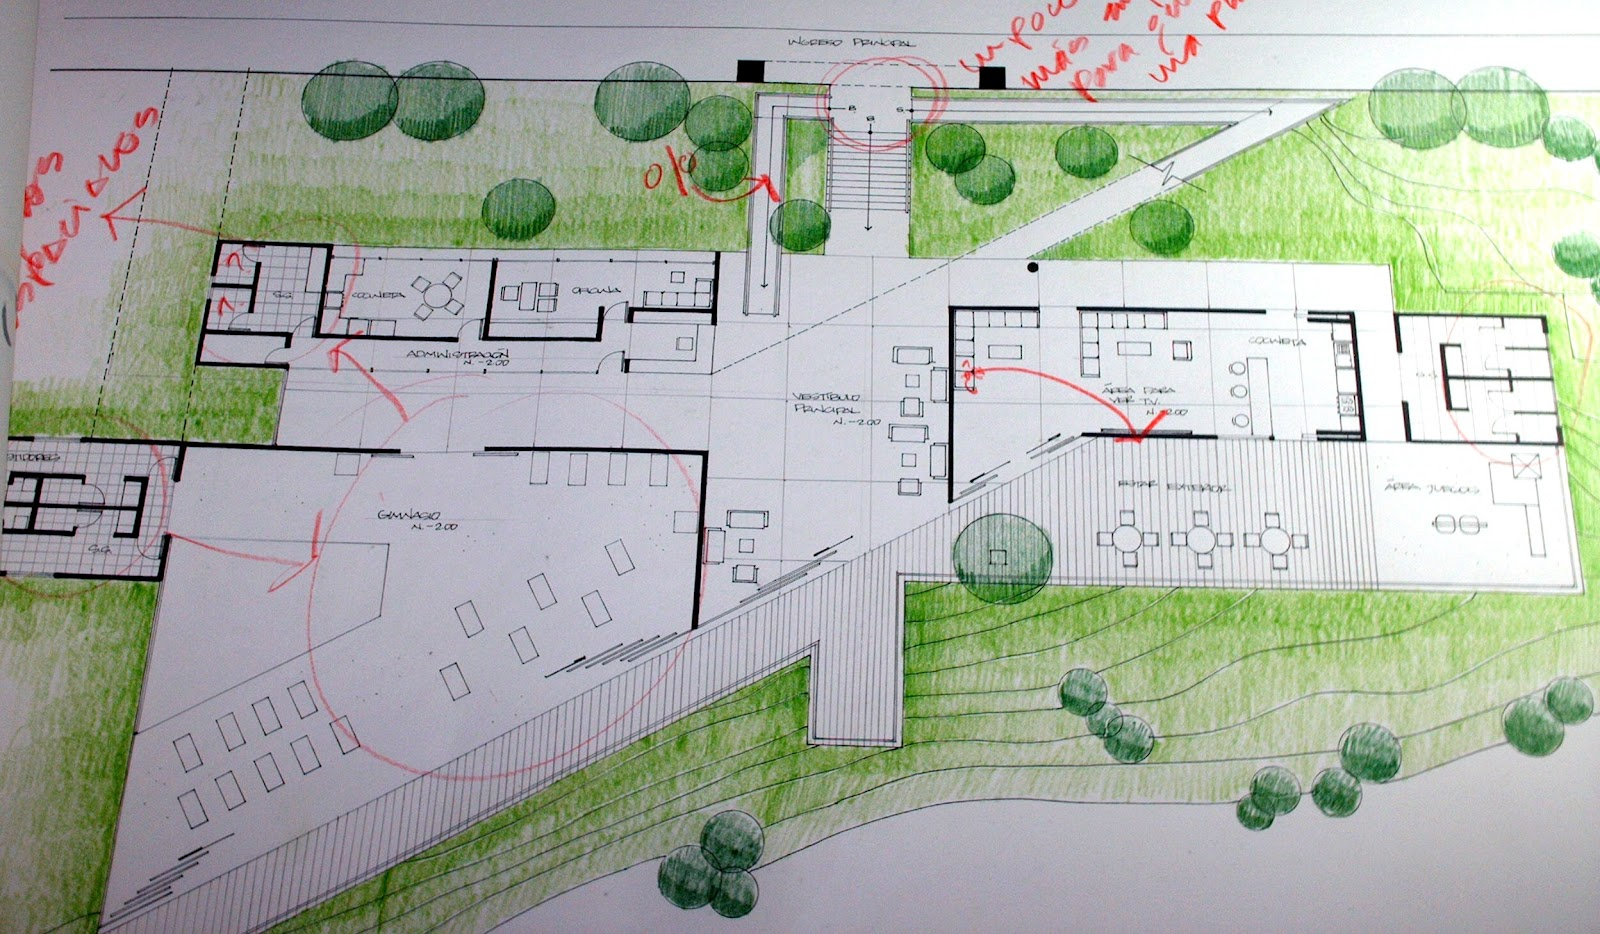 Arquitectura Ideas Y Expresi N Dise O Arquitect Nico